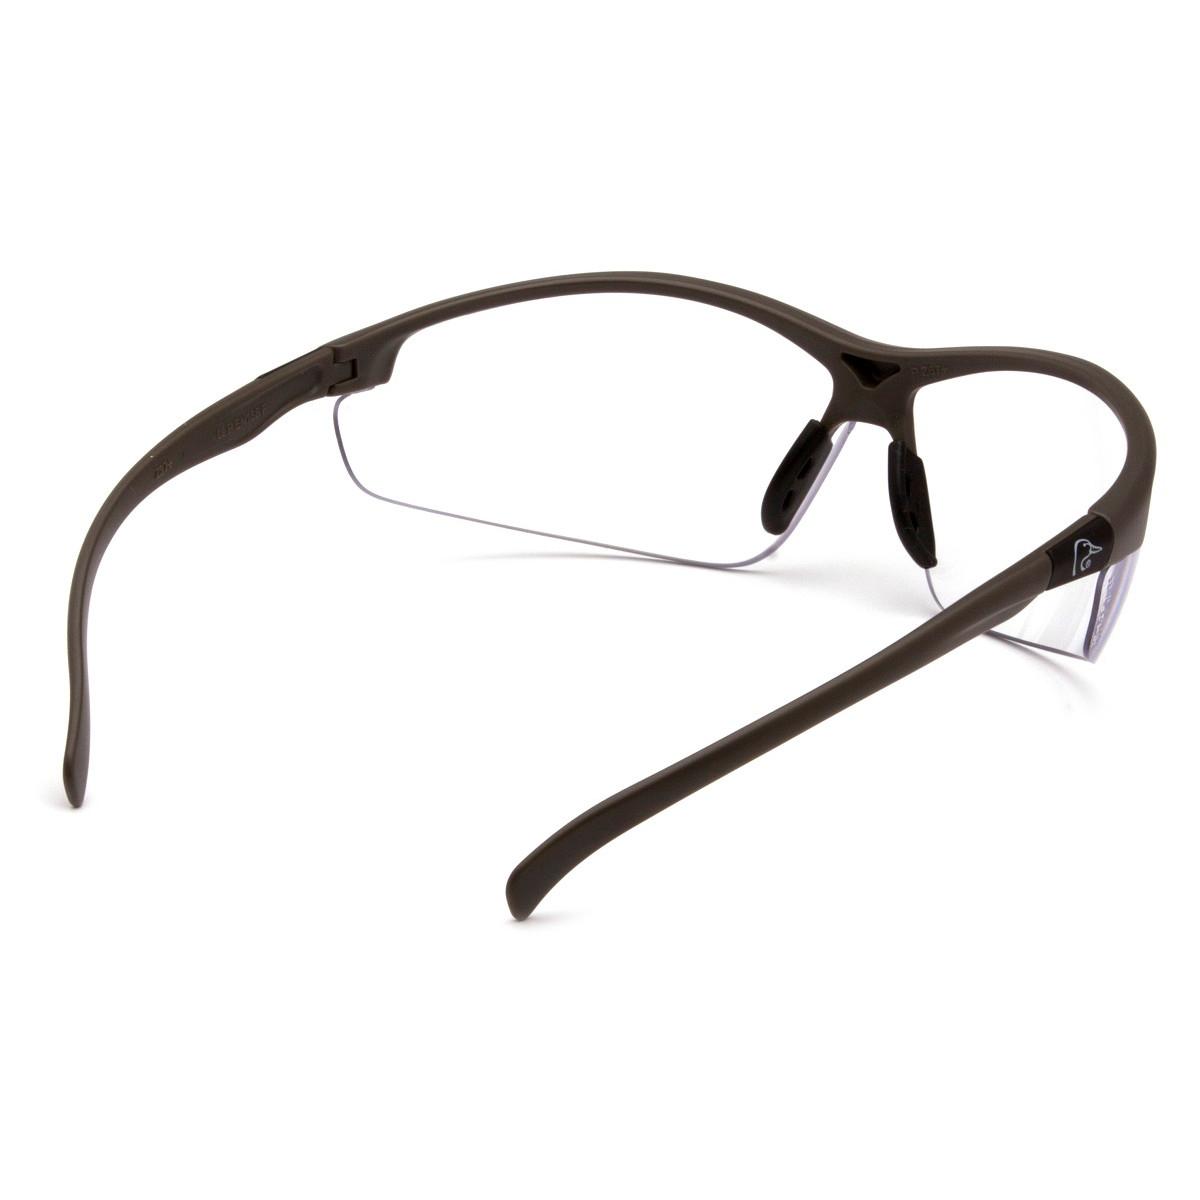 ducks unlimited dusb6610d shooting eyewear black frame